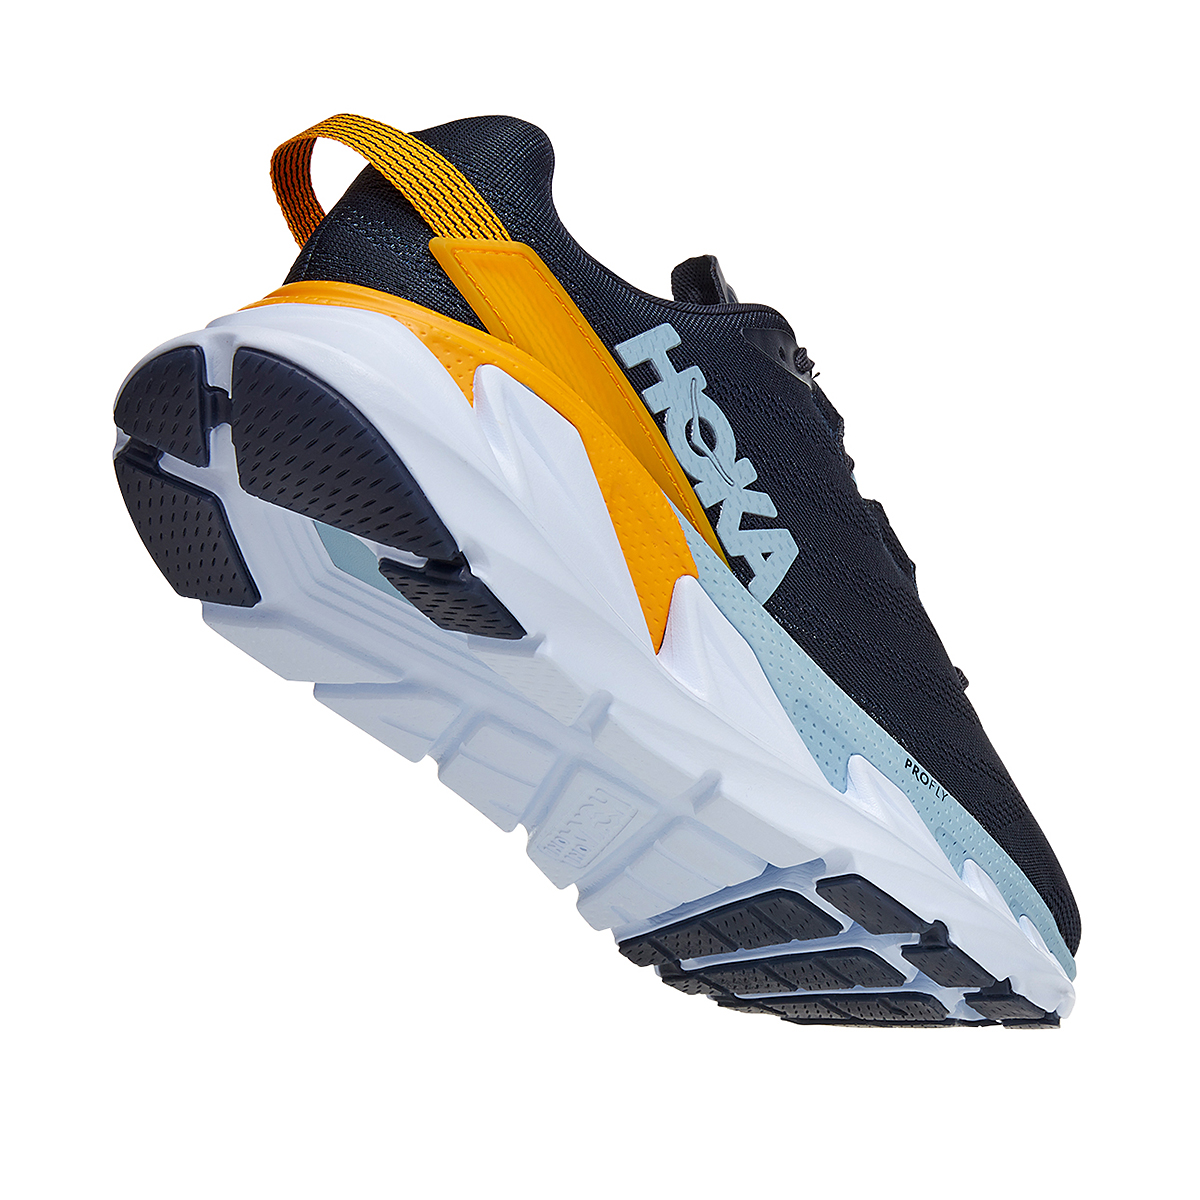 Men's Hoka One One Elevon 2 Running Shoe - Color: Ombre Blue - Size: 7 - Width: Regular, Ombre Blue, large, image 4